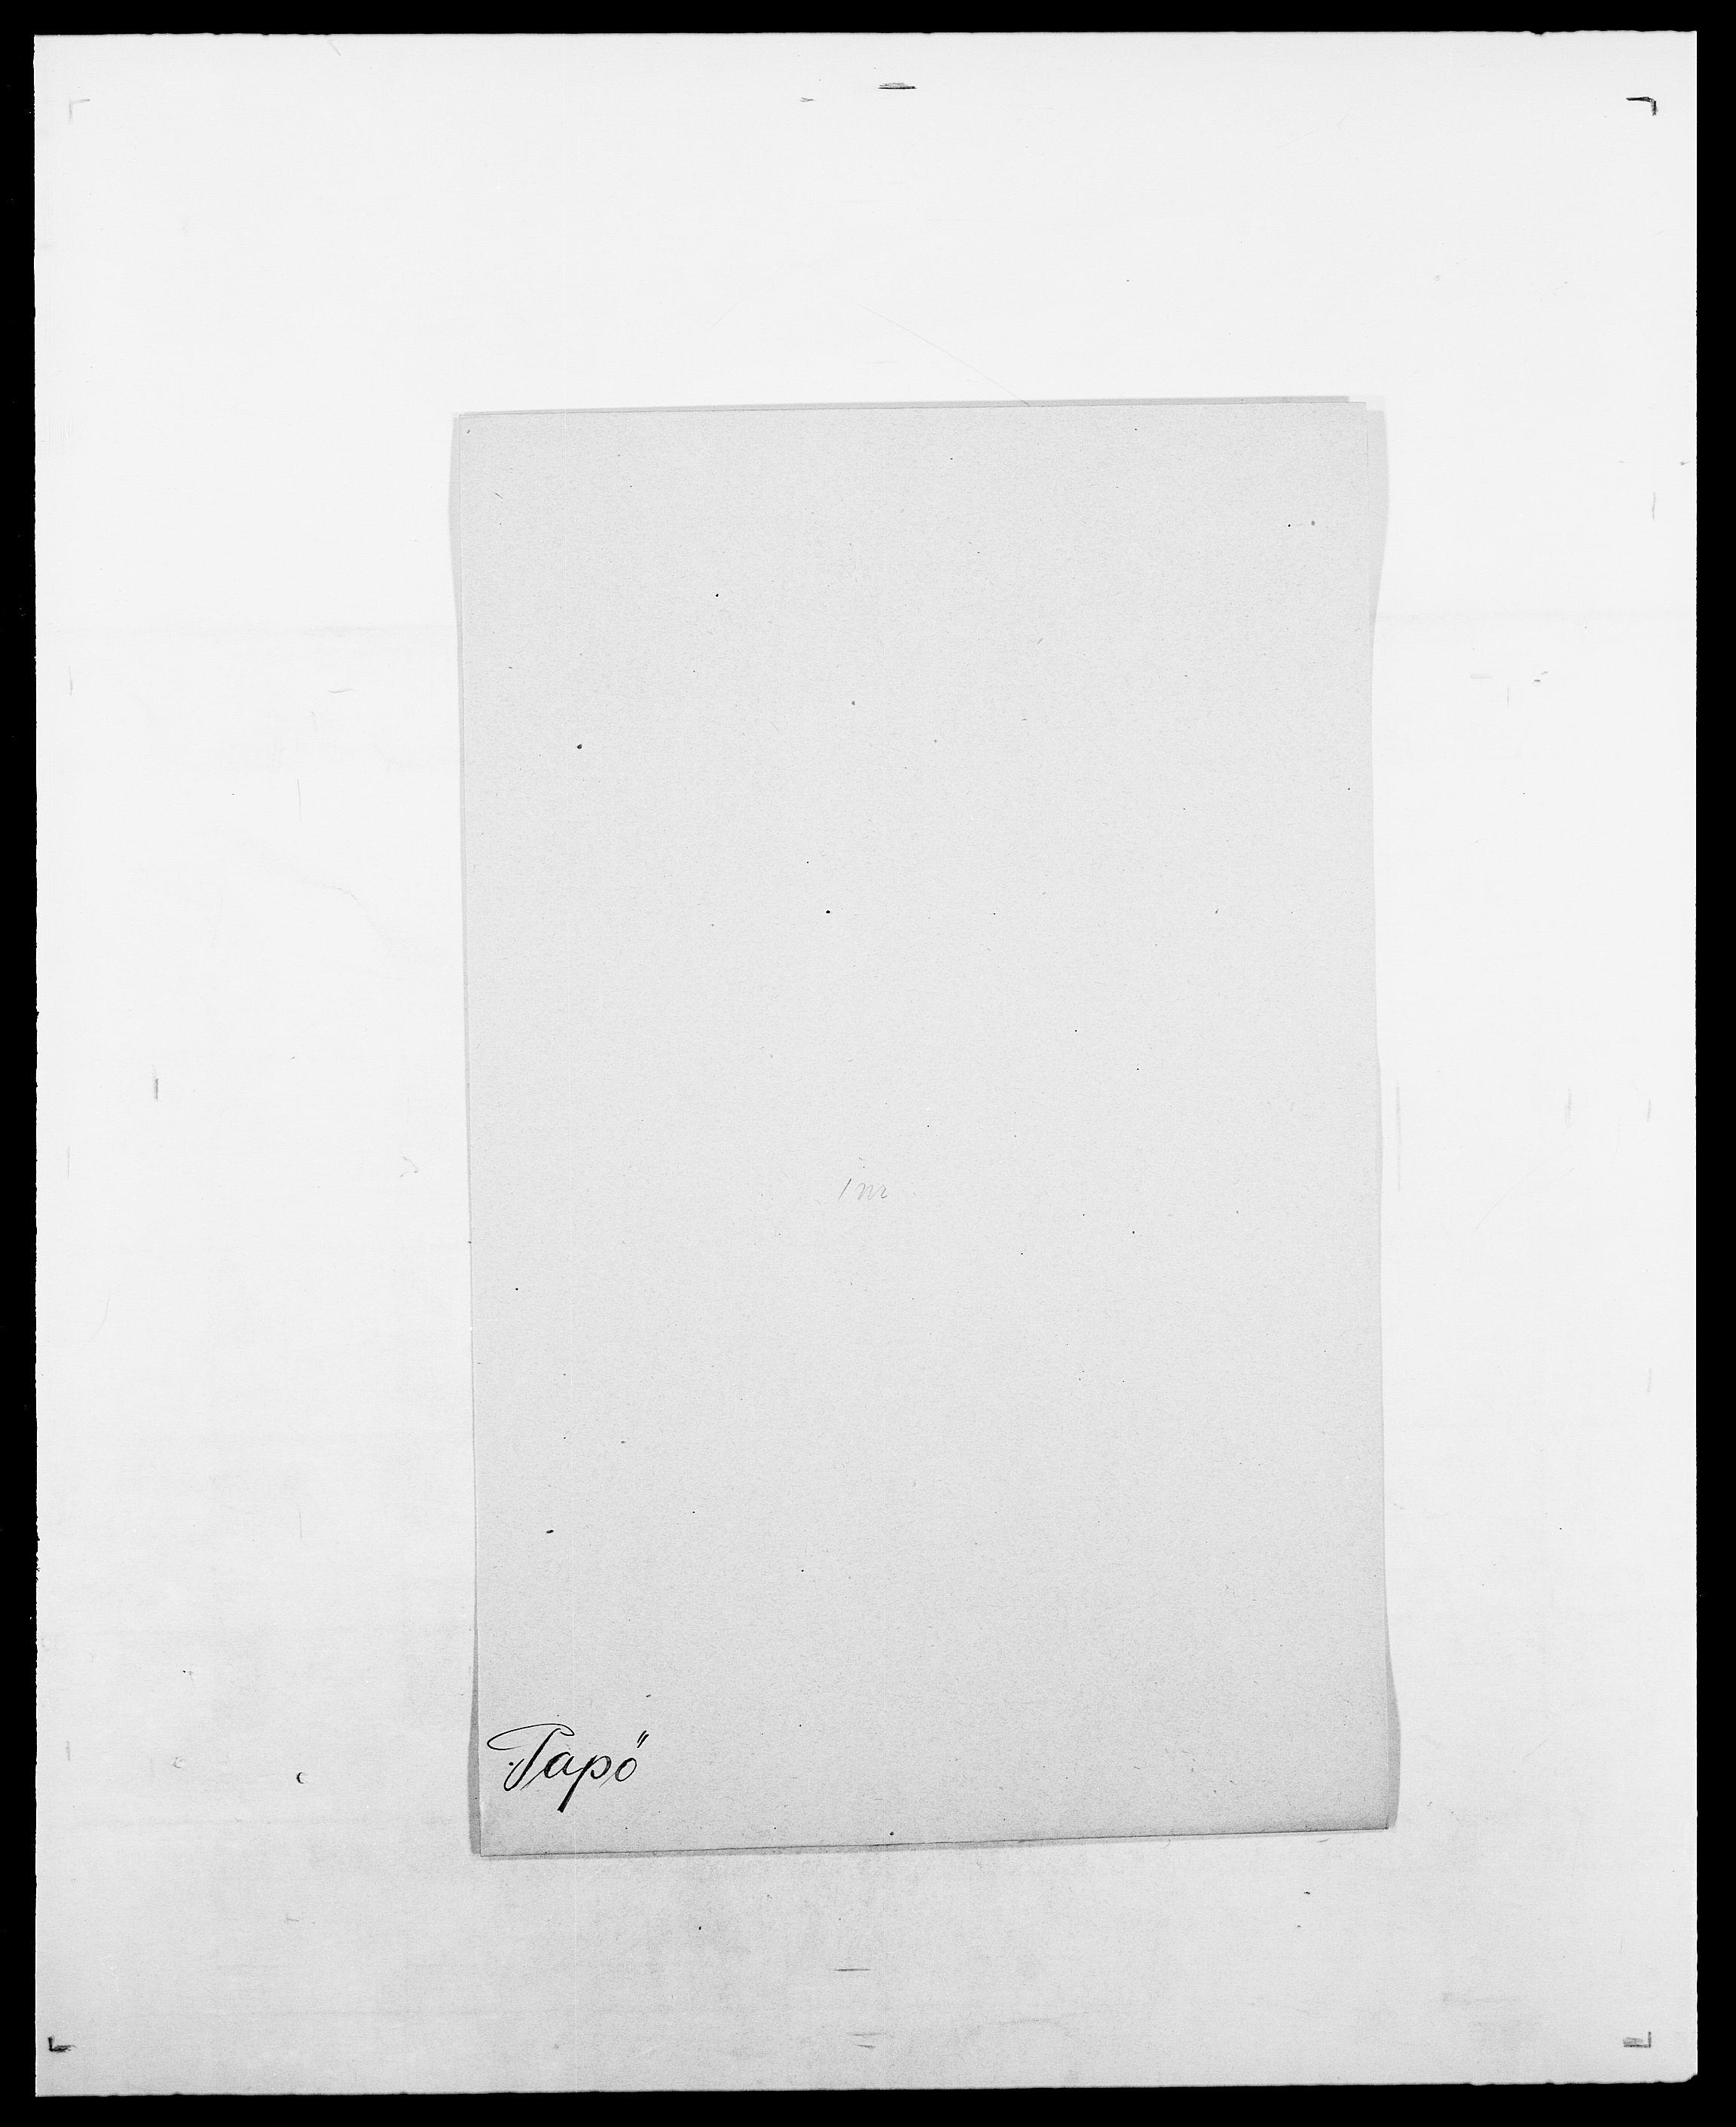 SAO, Delgobe, Charles Antoine - samling, D/Da/L0030: Paars - Pittelkov, s. 94